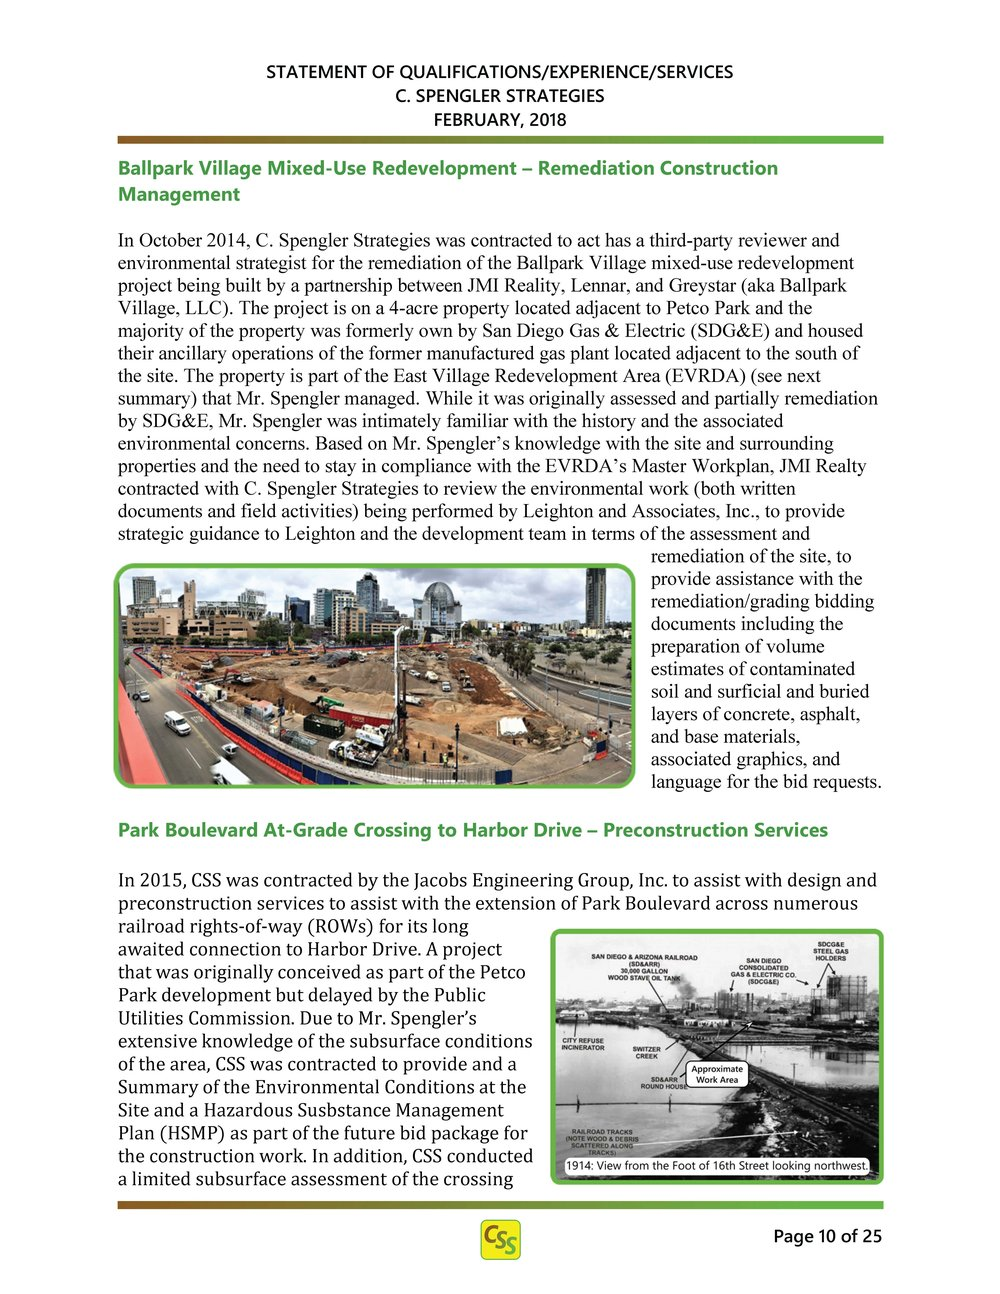 C.Spengler Strategies SOQ.2.13.18_Page_11.jpg